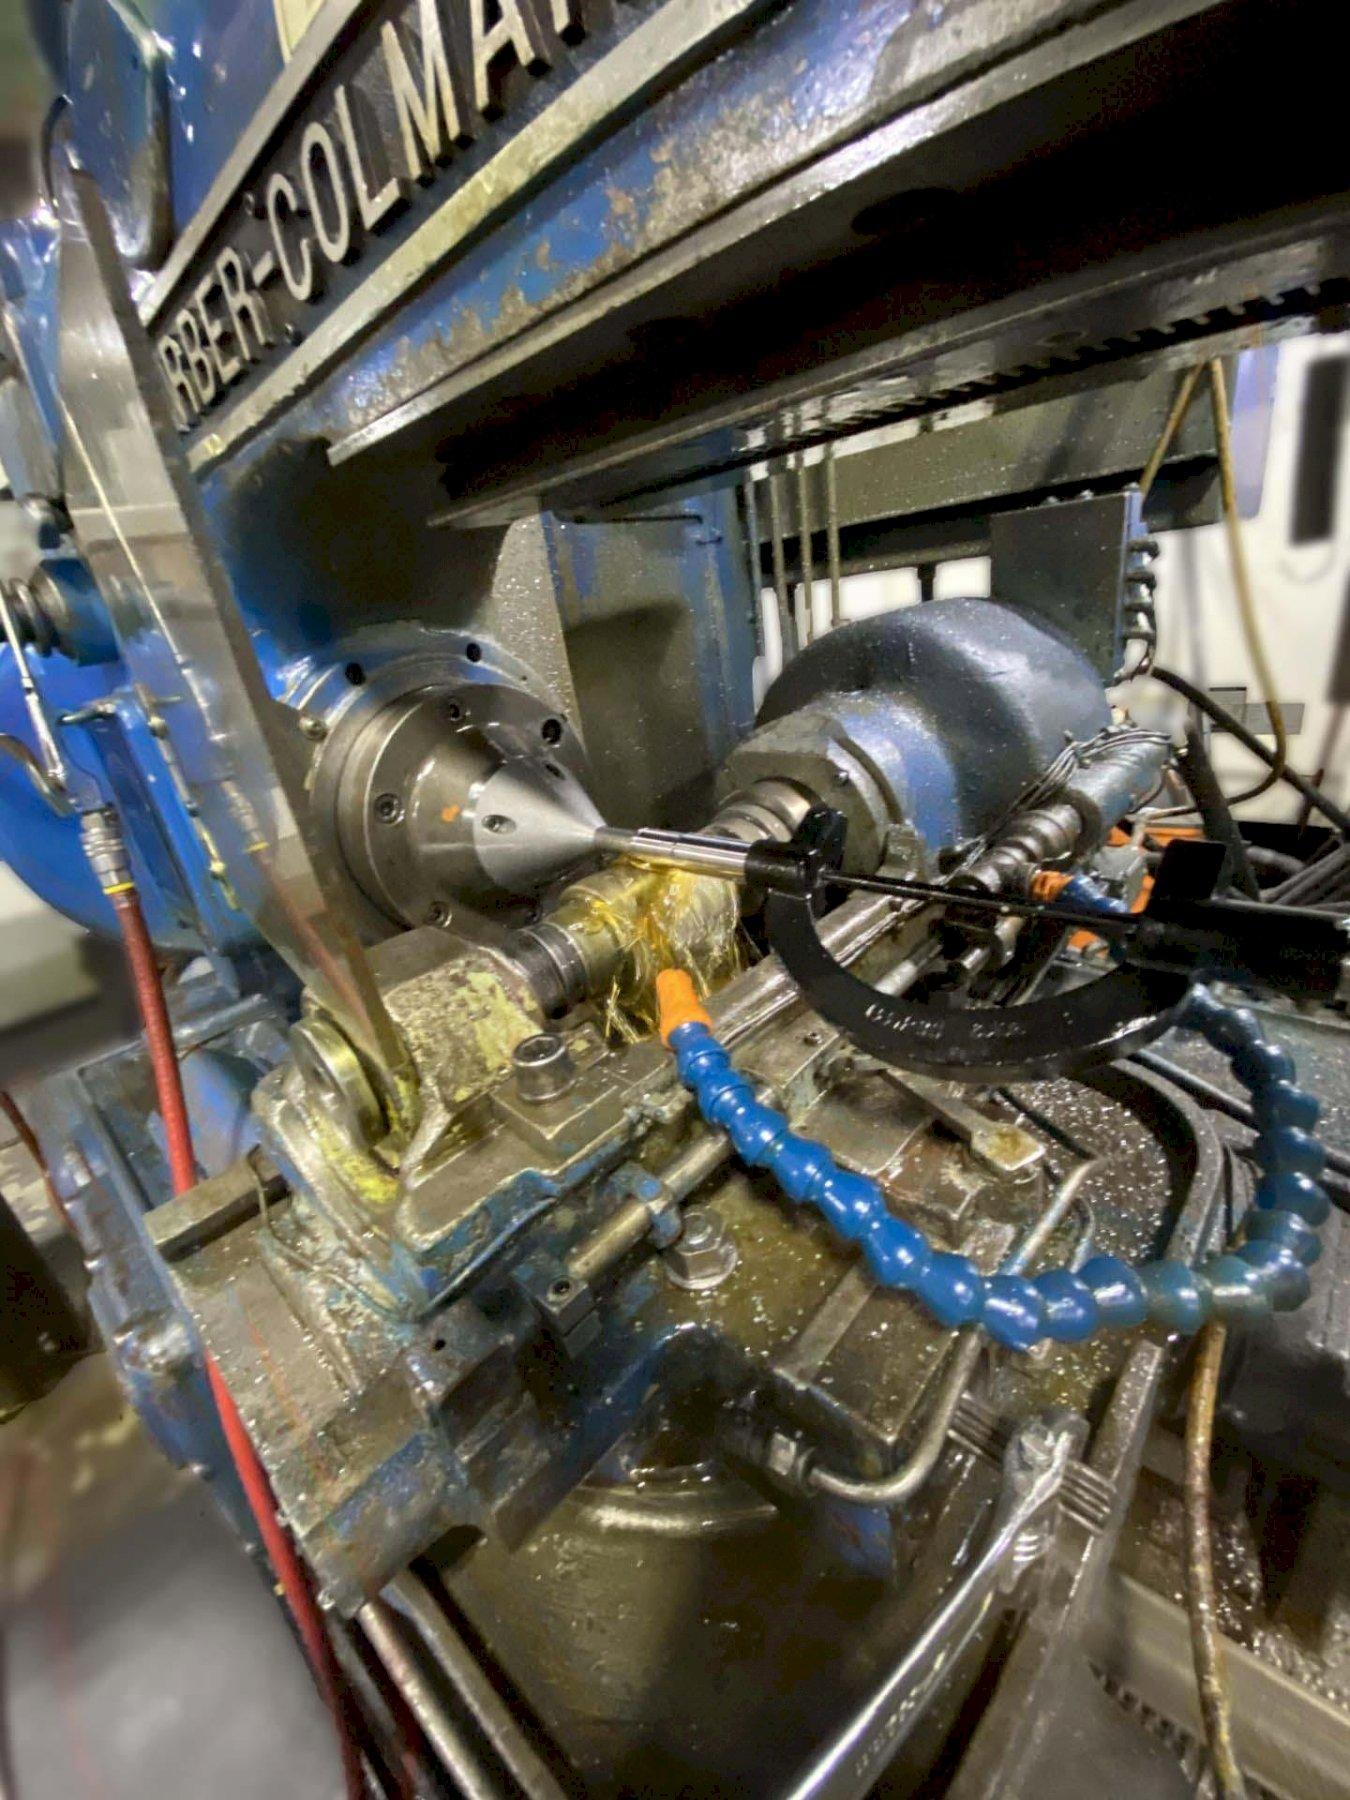 "14-30 BARBER COLMAN HORIZONTAL GEAR HOBBER, 14"" Max Work Diameter, 30"" Max Hob Slide Travel, 6.25"" Max Hob Diameter, Auto Hob Shift, Auto 2-Cut Cycle, Hydraulic Workhead, Hydraulic & Coolant System, New 1970."